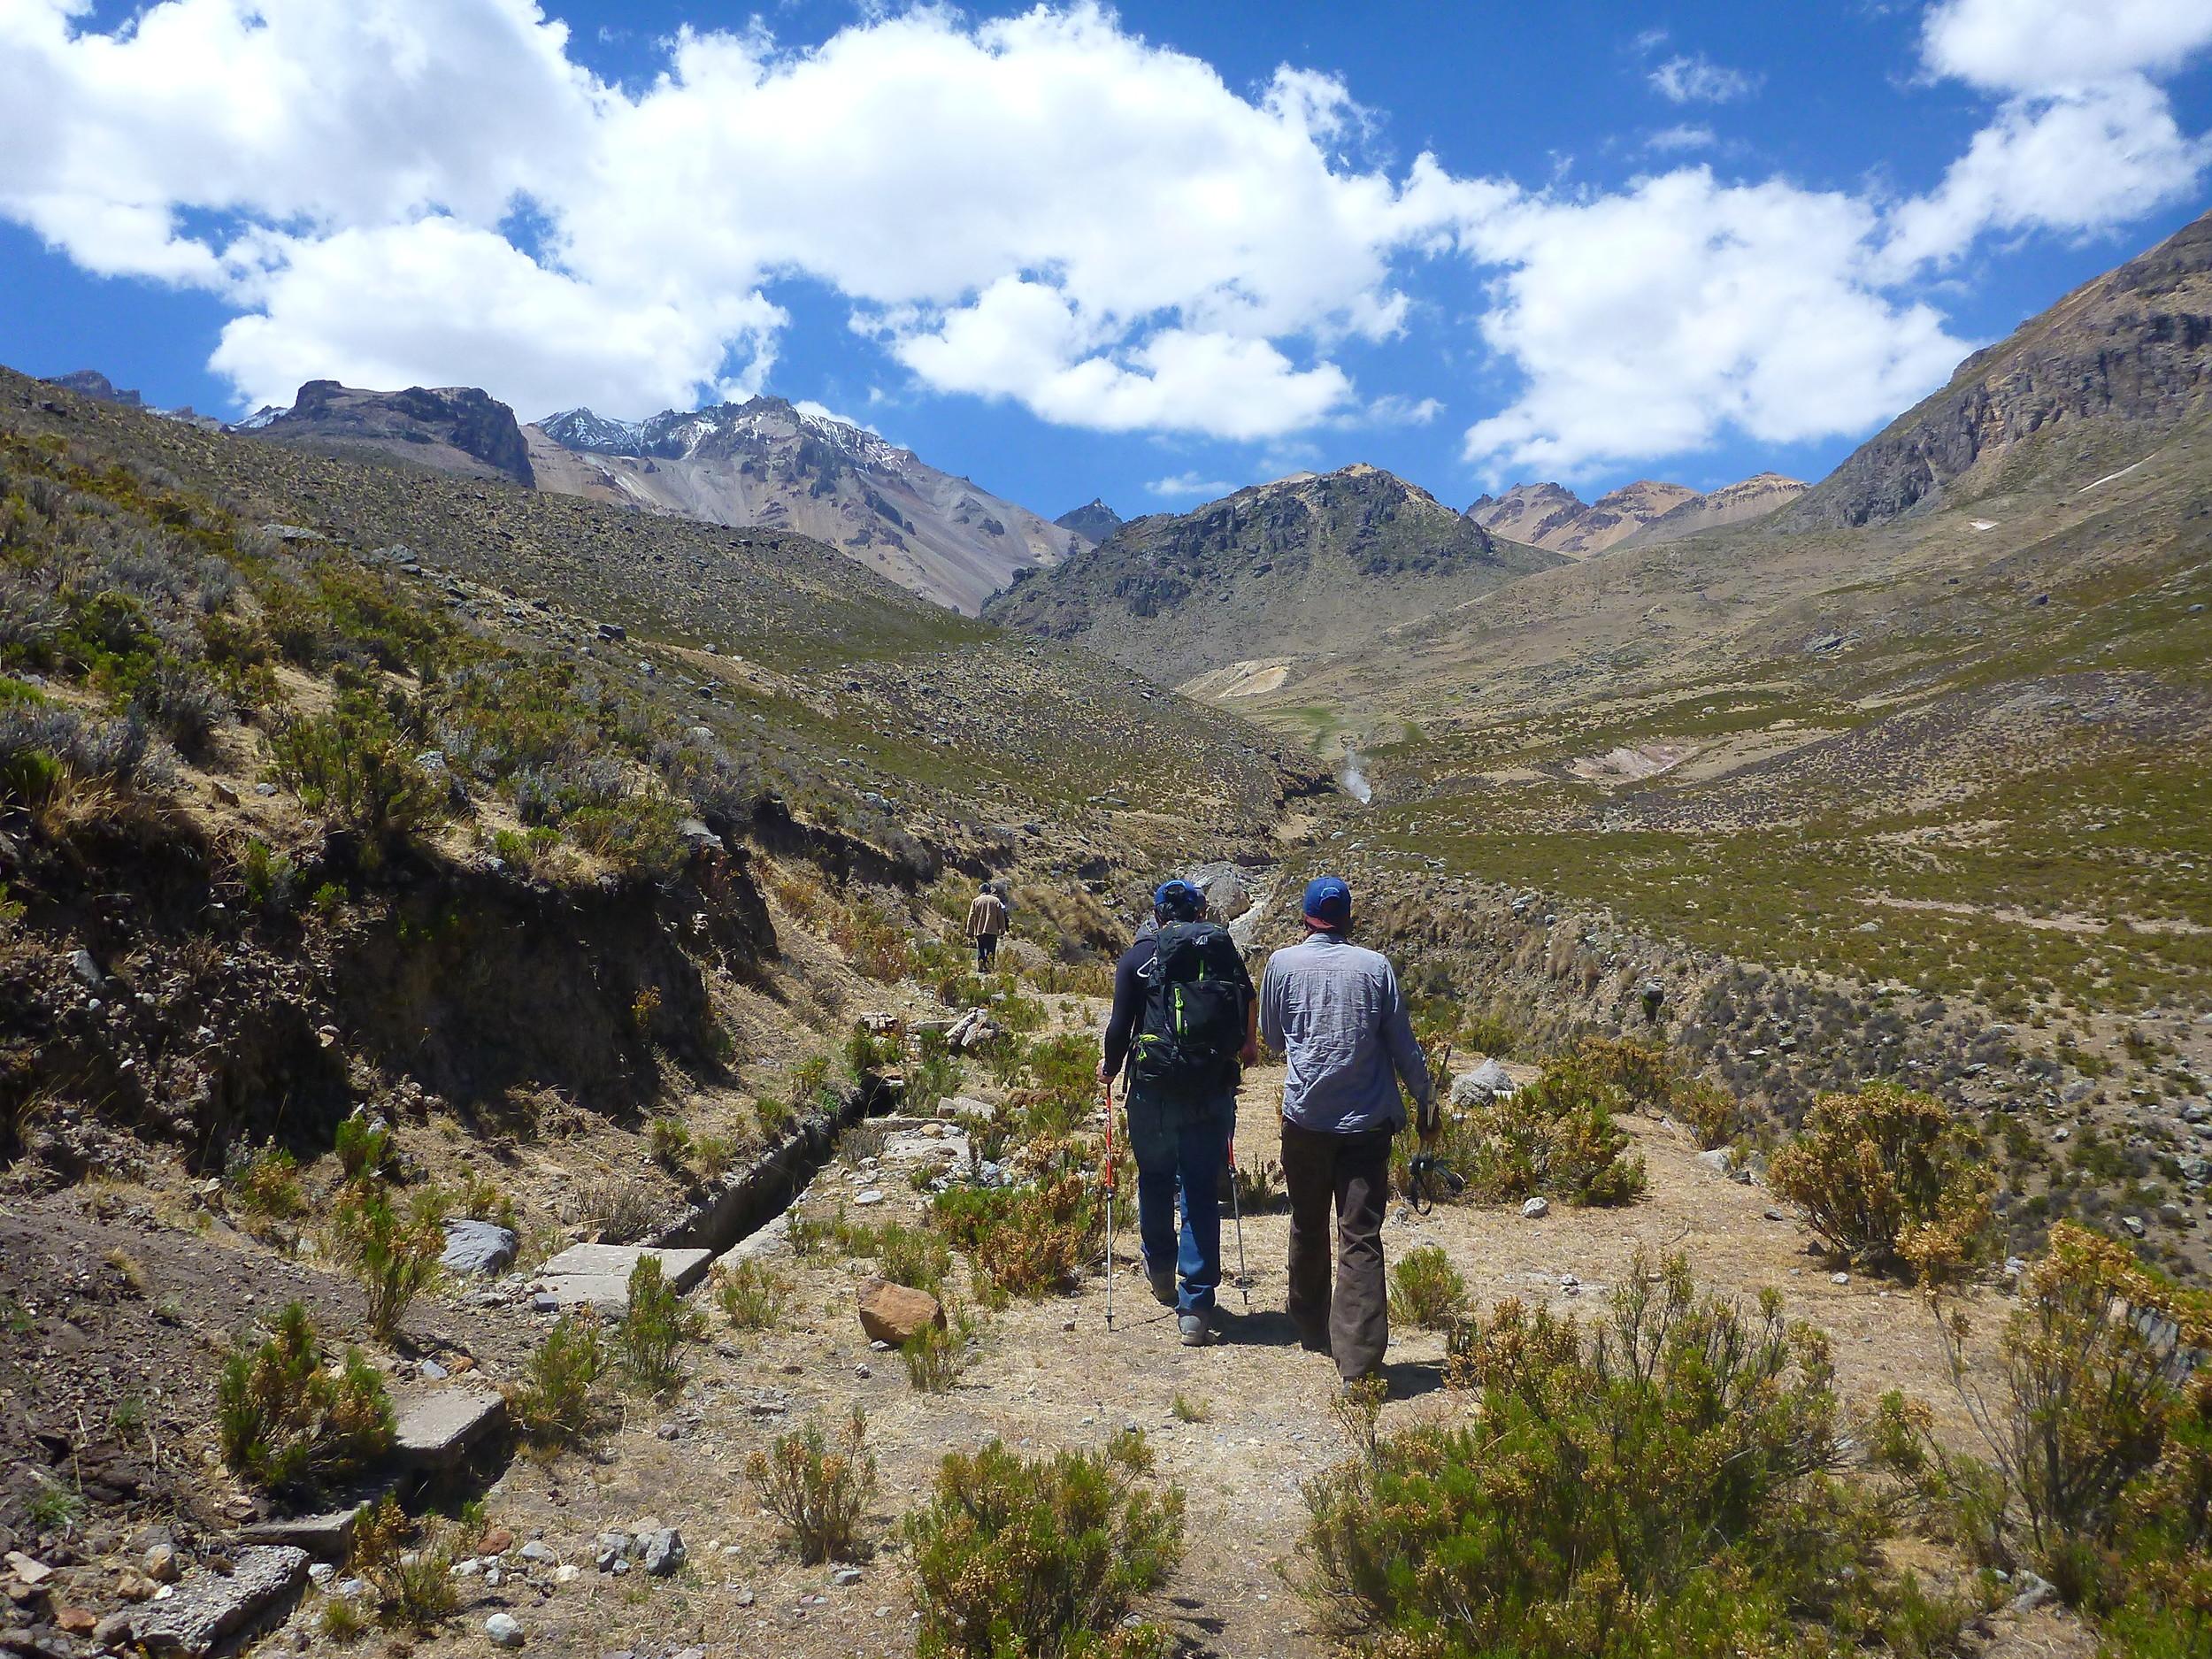 Hiking up to Hualca Hualca.